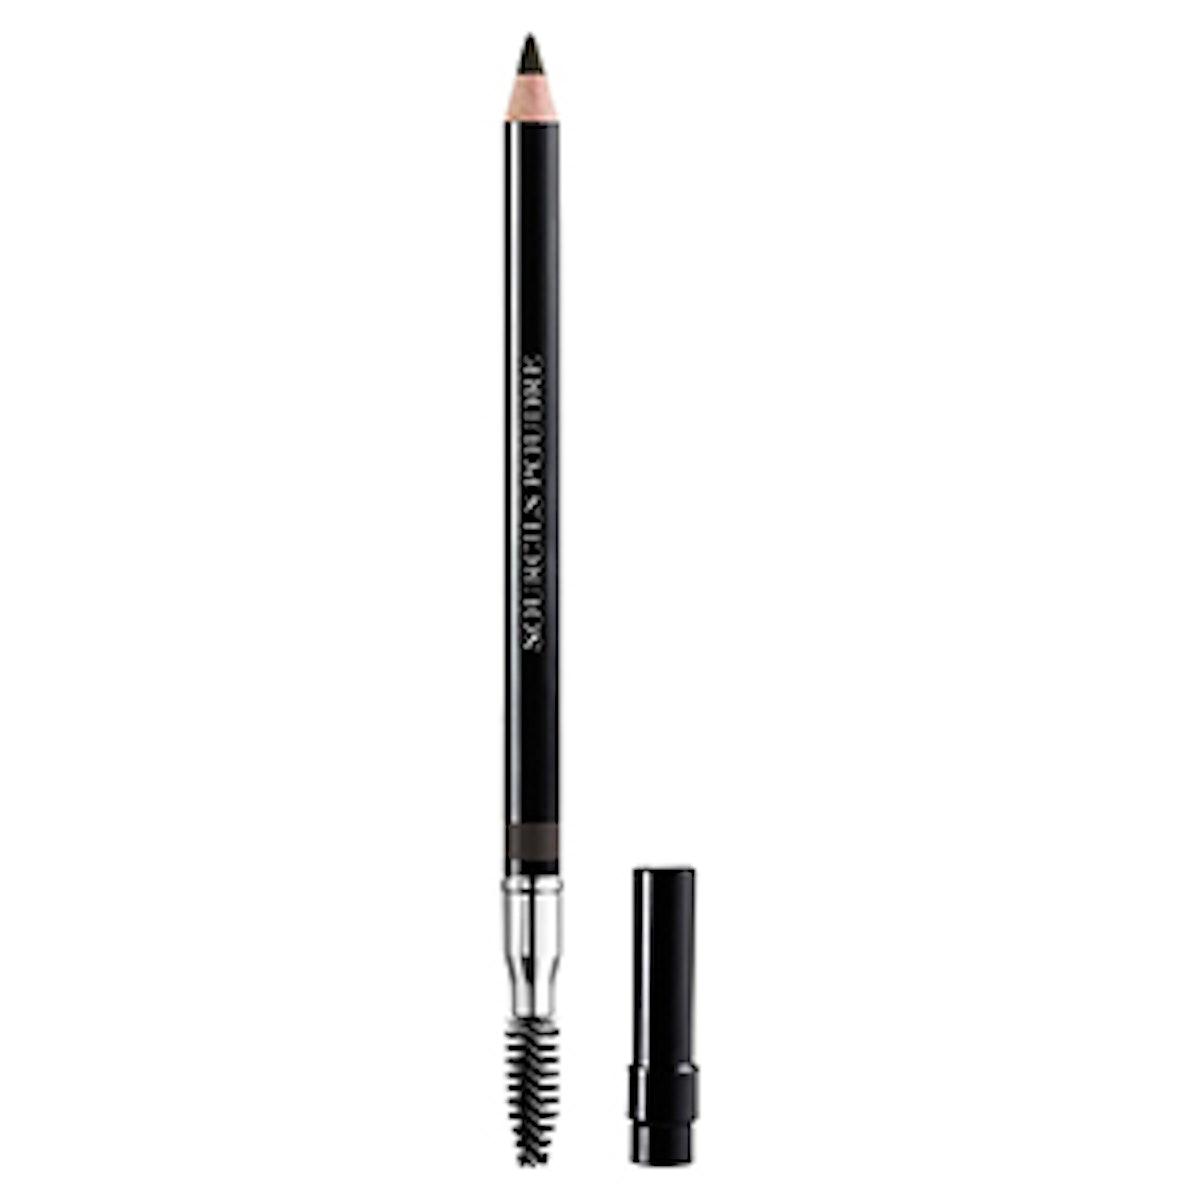 'Sourcils Poudre' Powder Eyebrow Pencil